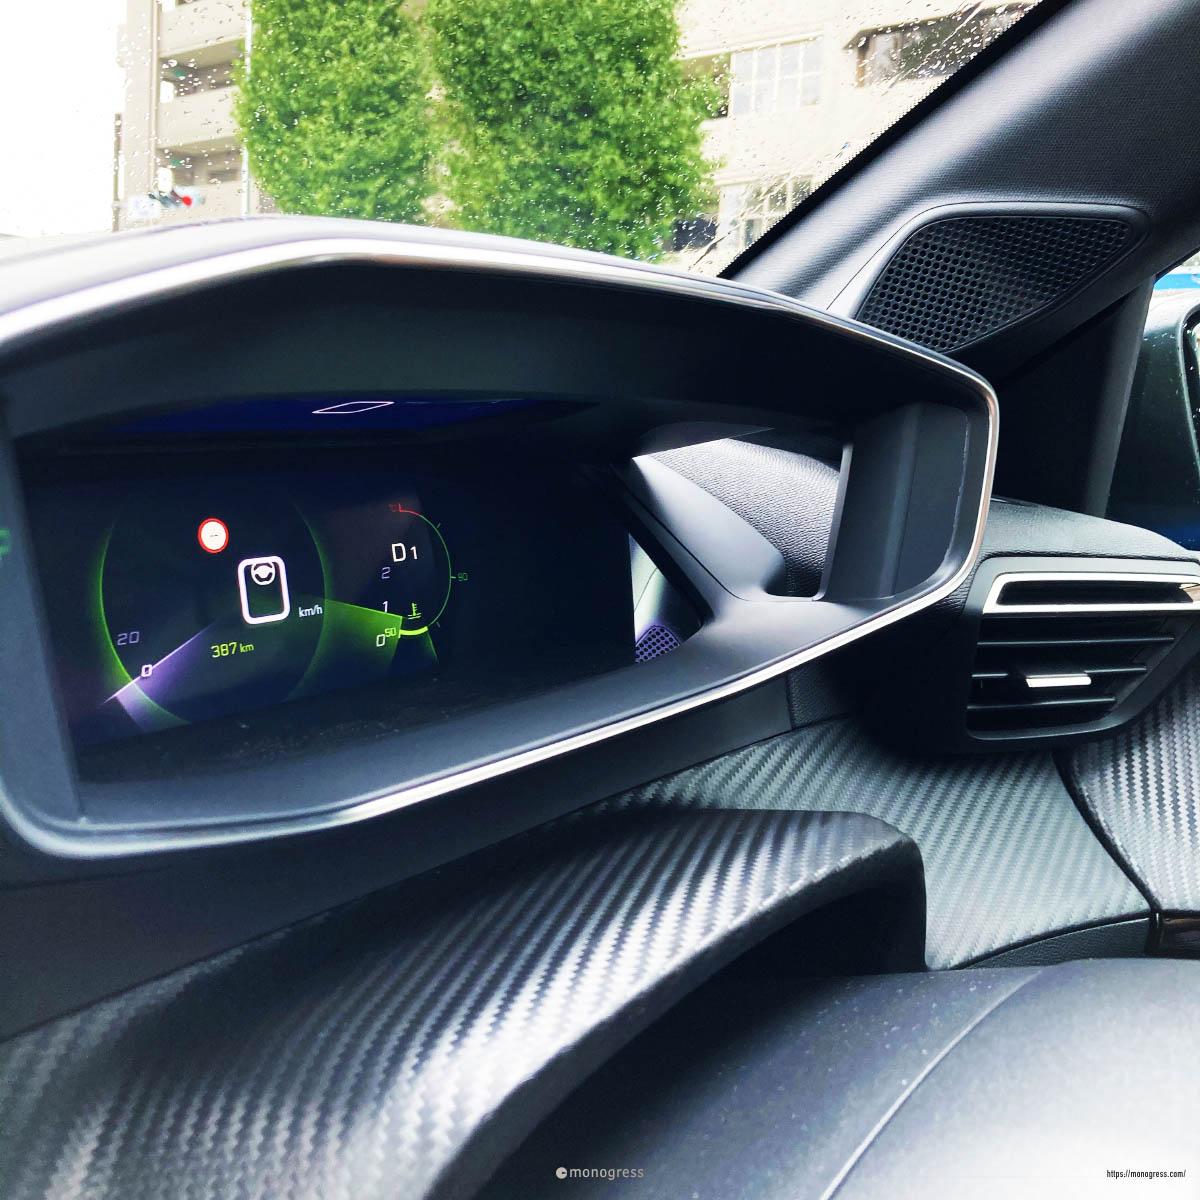 Peugeot 208 3D i-Cockpit